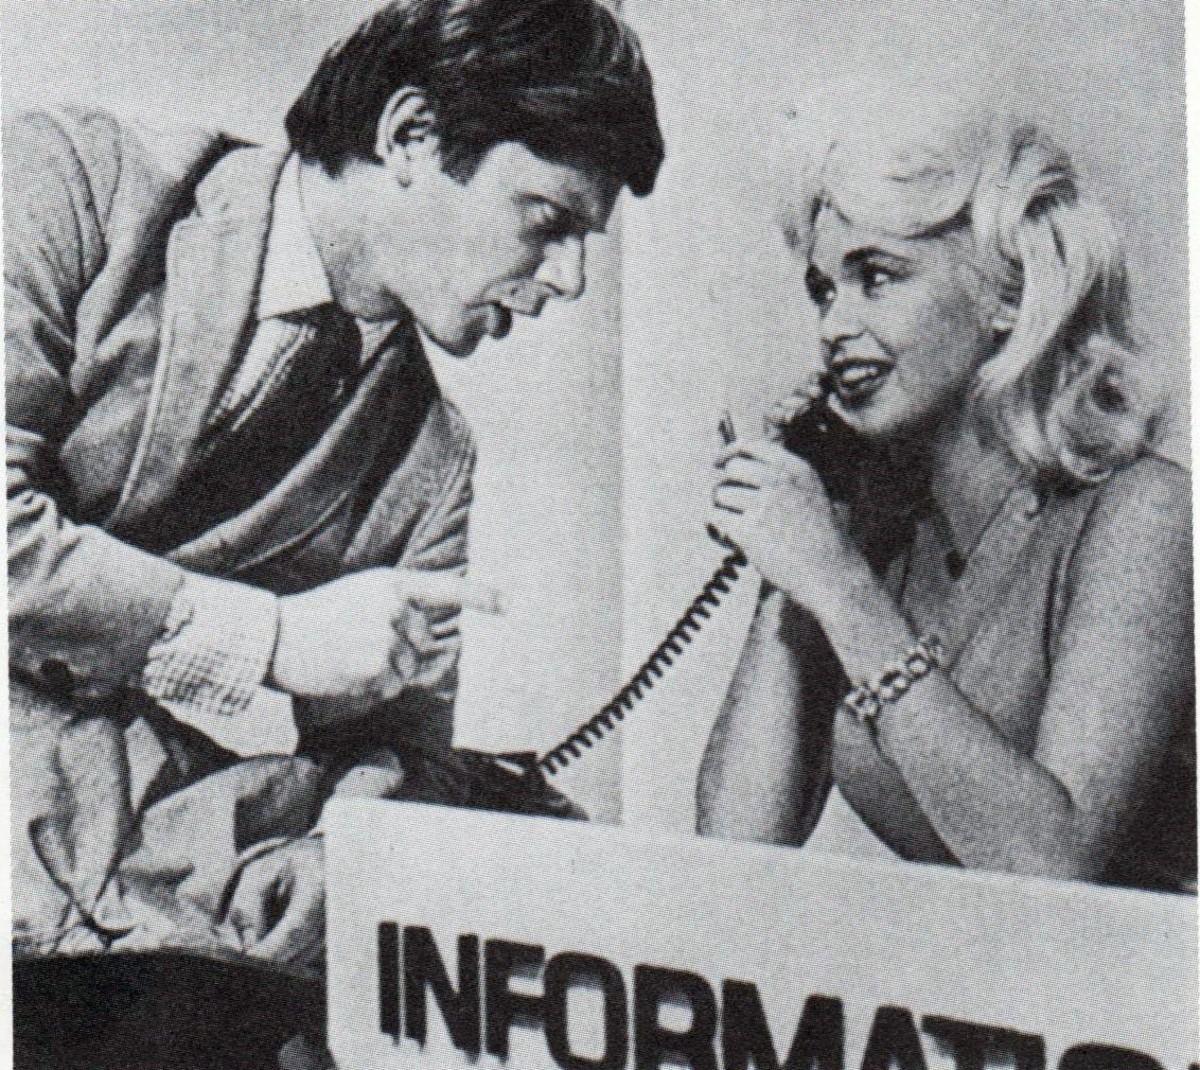 Jayne with Robert Morse